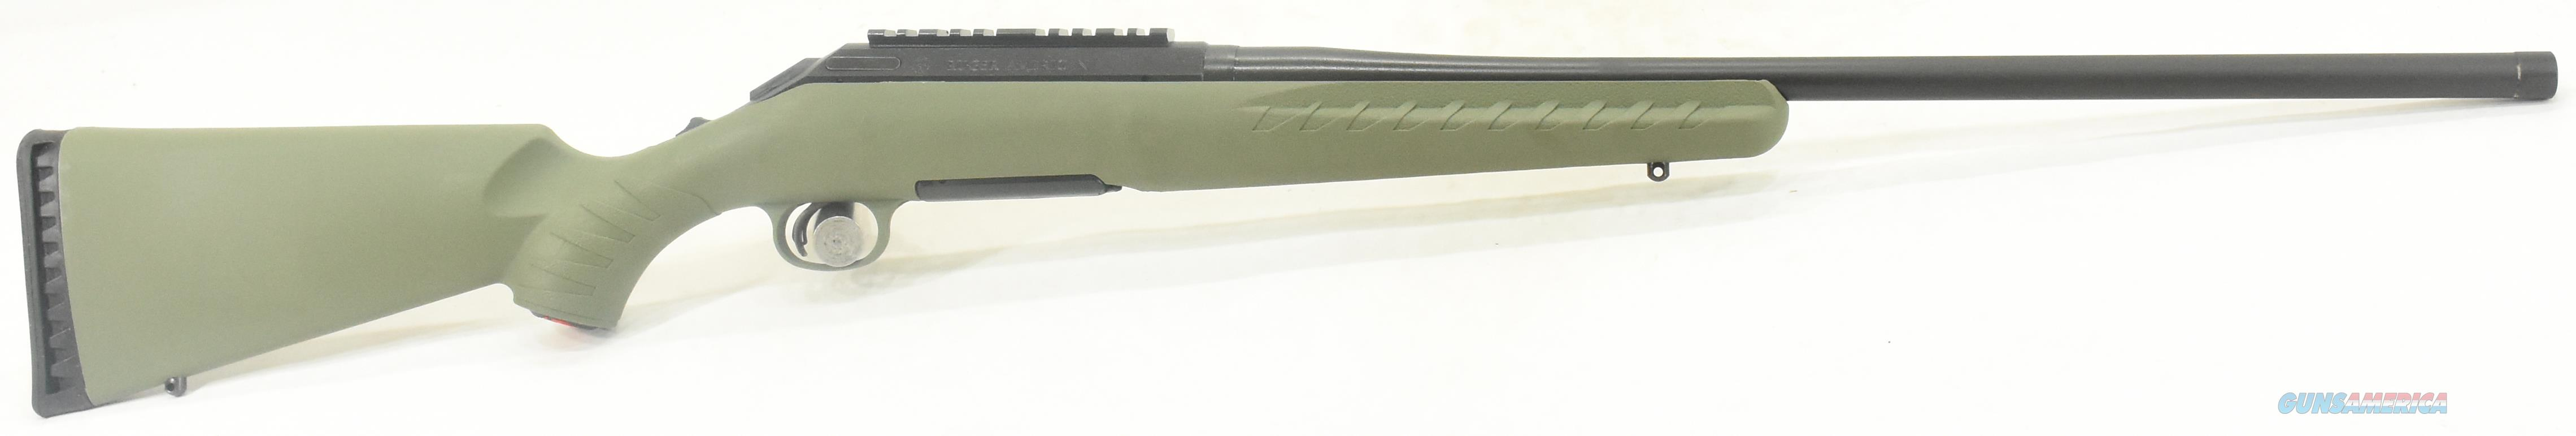 American Predator Green LH 7mm-08 22In  26917  Guns > Rifles > Ruger Rifles > American Rifle